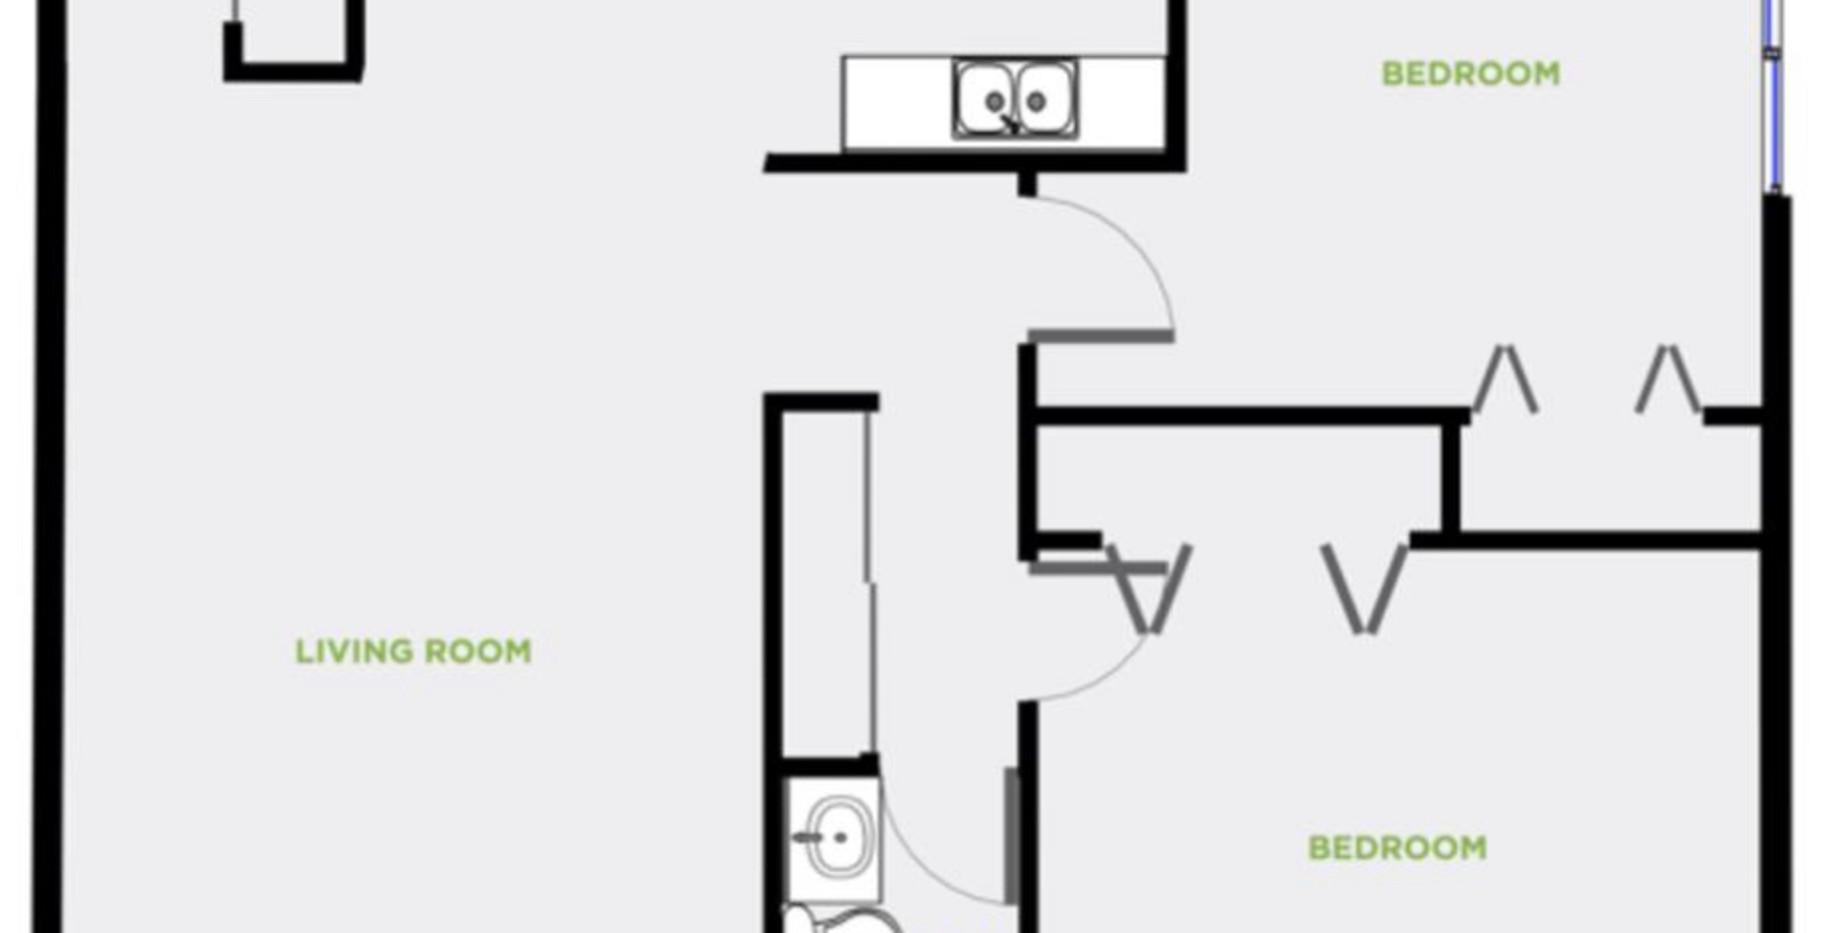 Two Bedroom Floor Plan.jpg